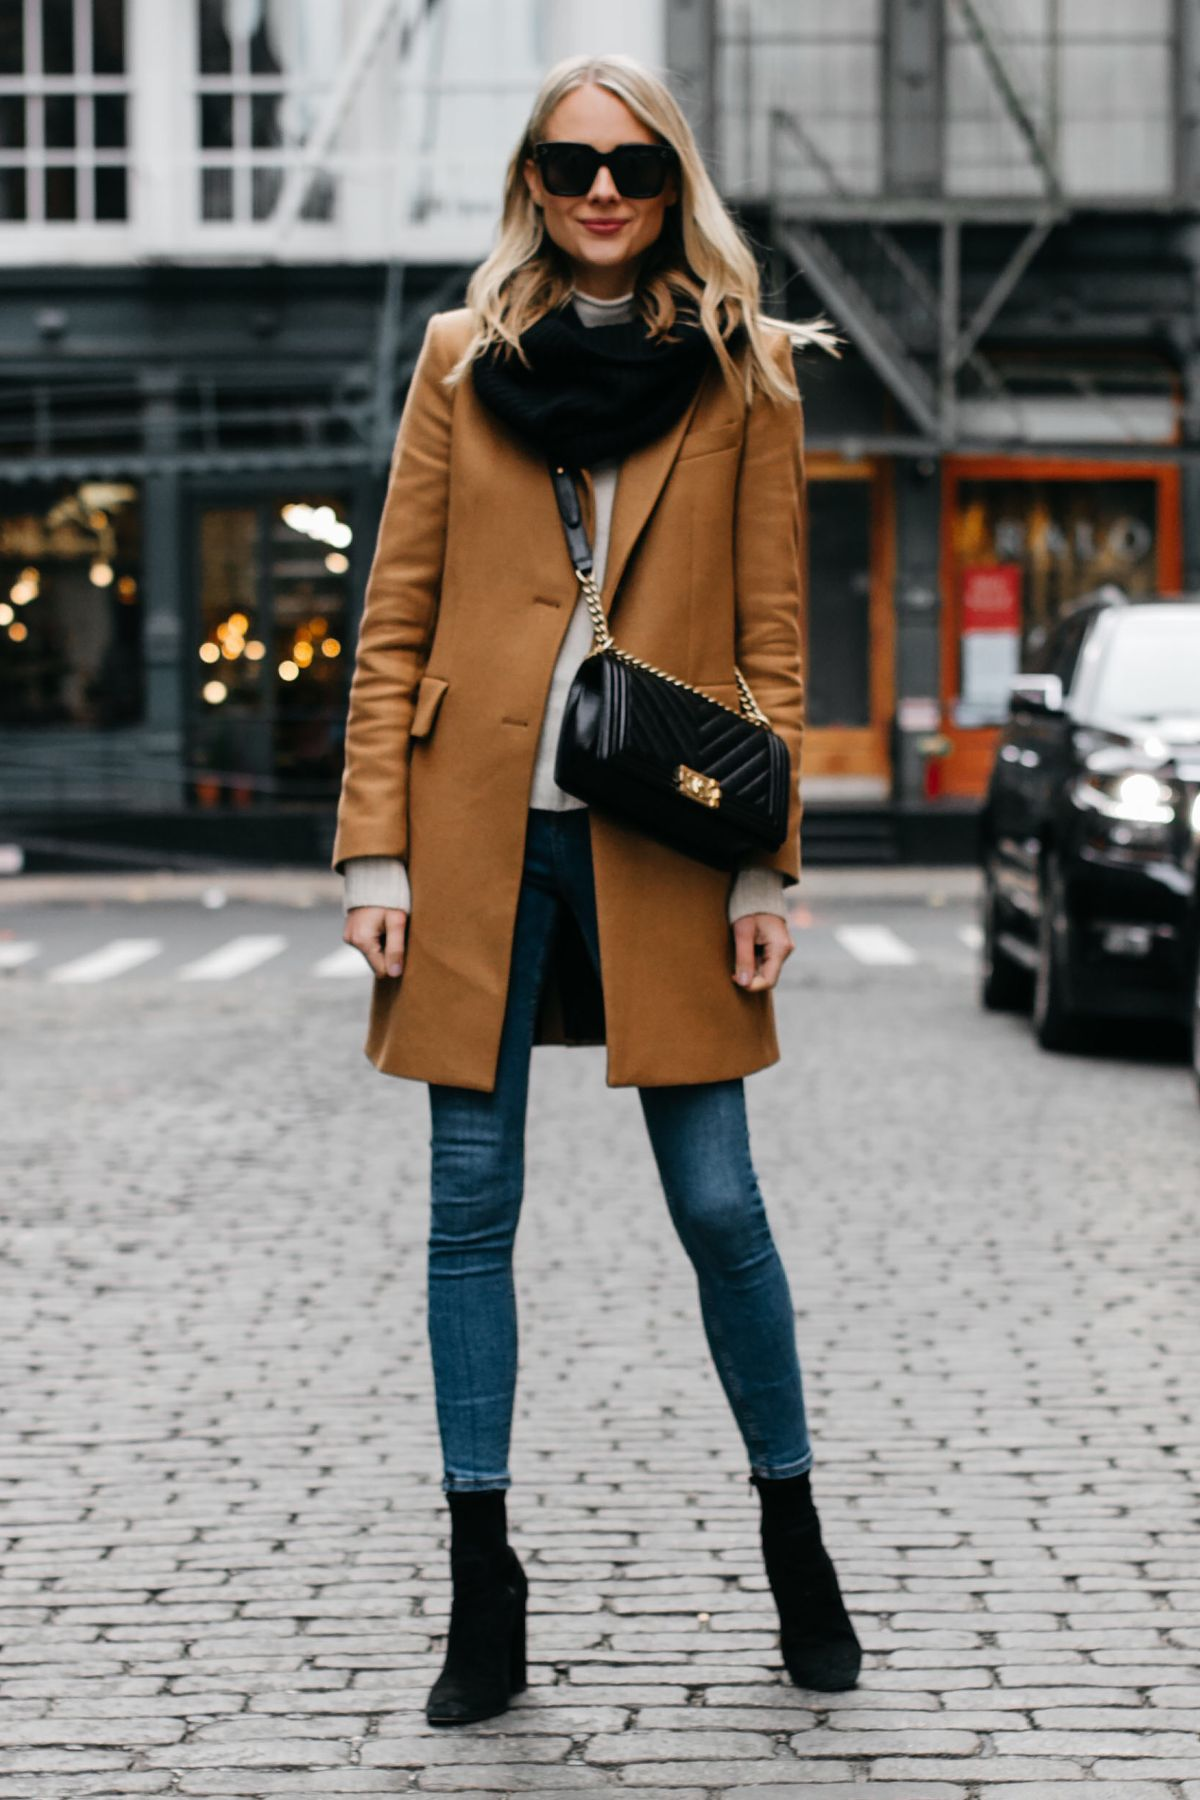 bb6847017c5 Blonde Woman Wearing Camel Coat Black Scarf Denim Skinny Jeans Black  Booties Chanel Black Boy Bag Fashion Jackson Dallas Blogger Fashion Blogger  NYC Street ...